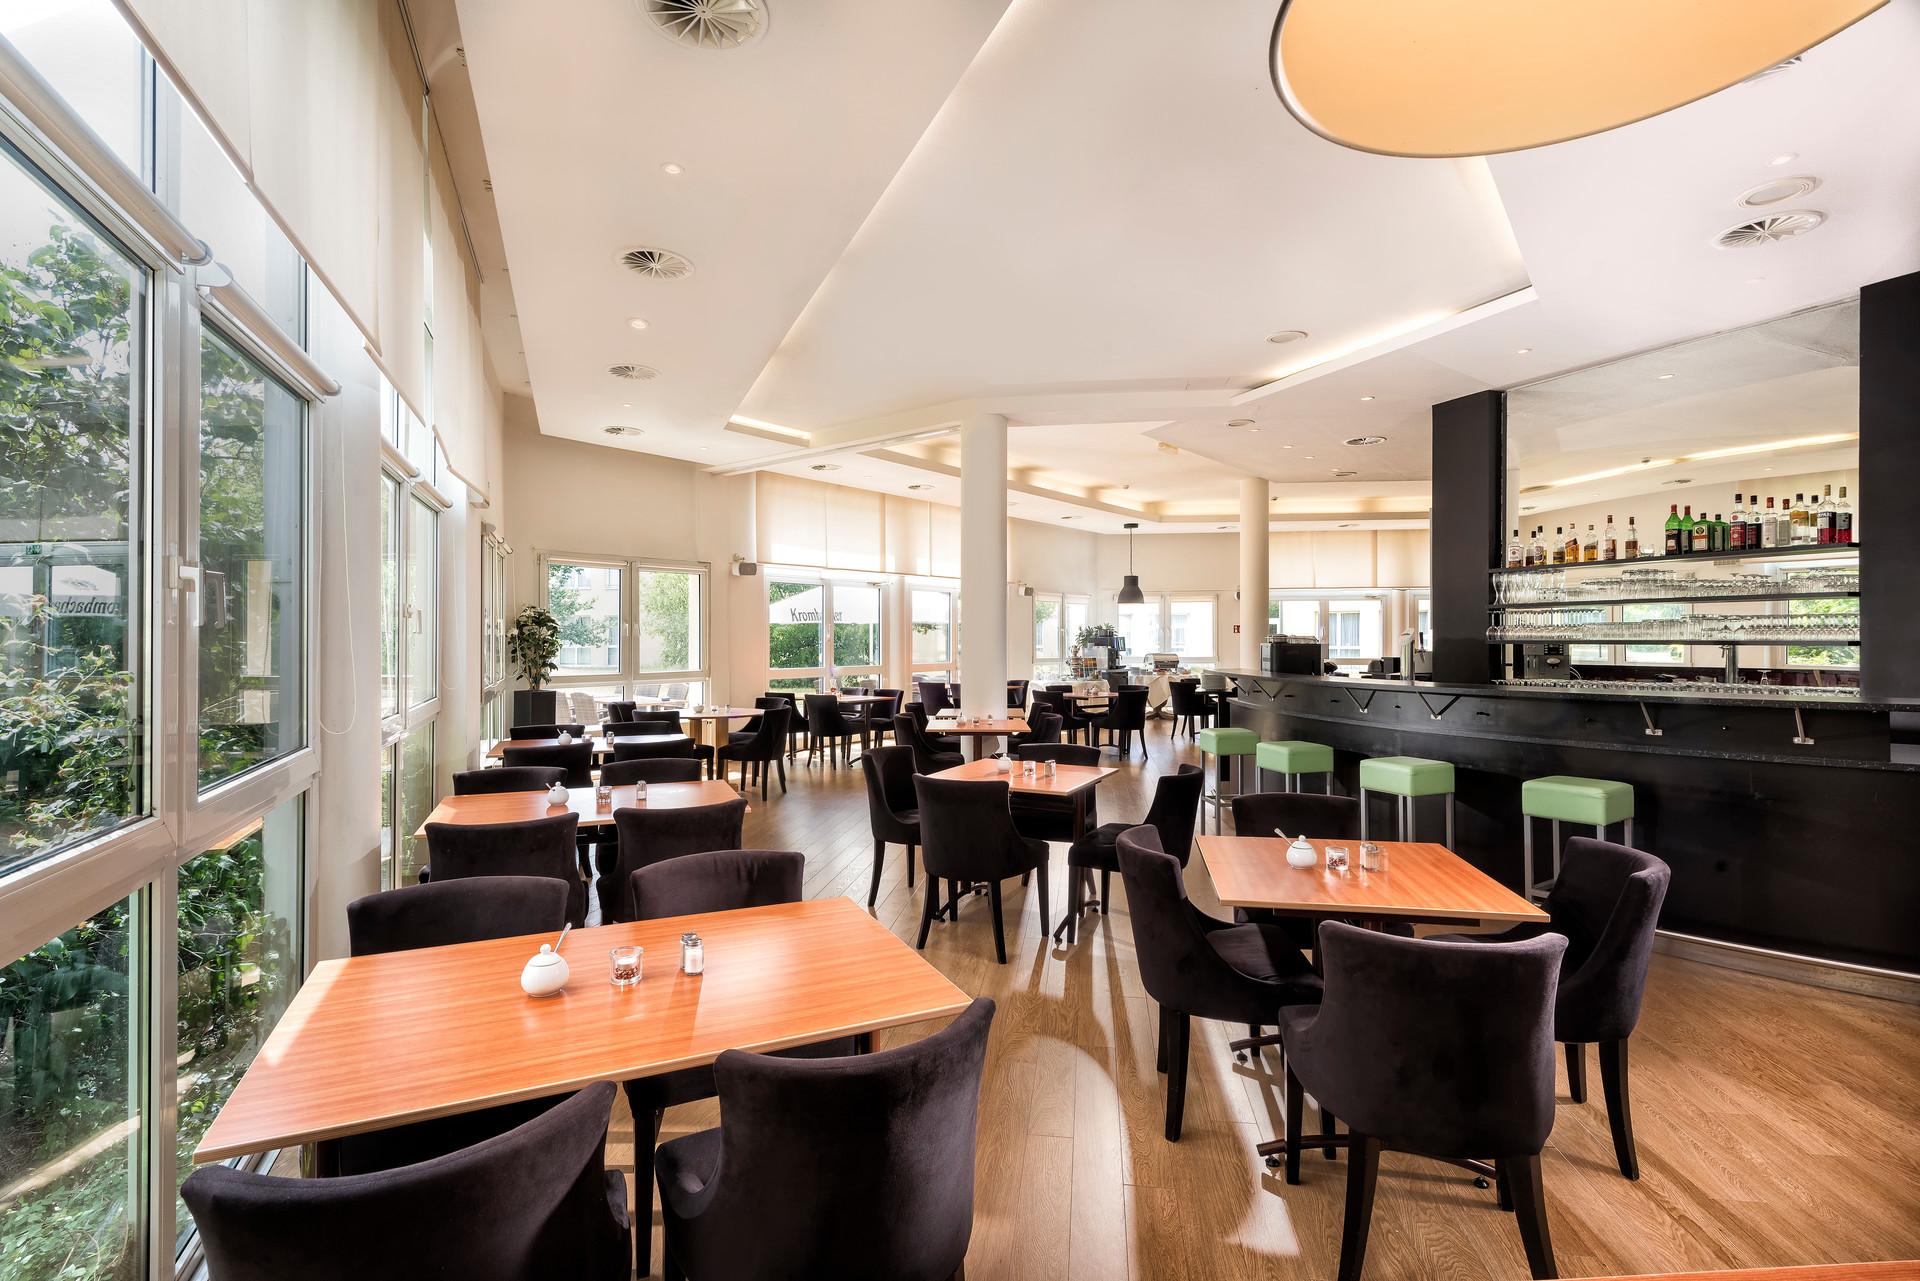 Days Inn Hotel Dessau Restaurant